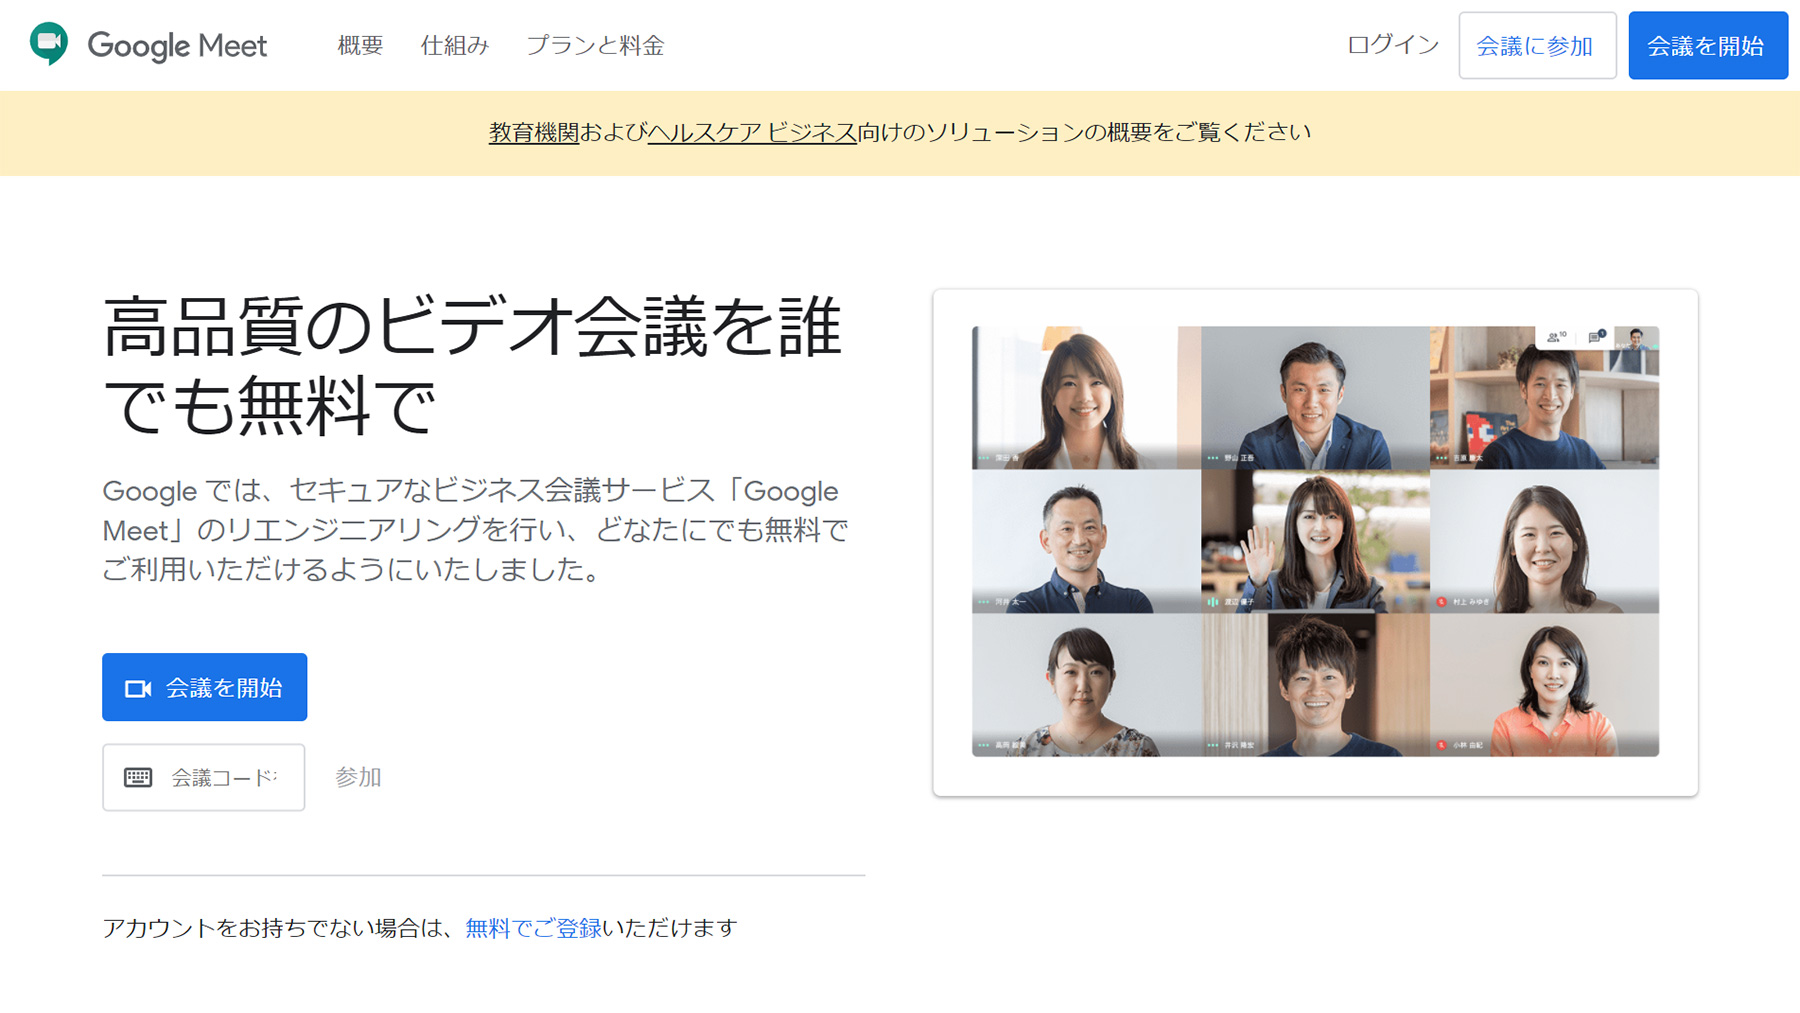 Google Meet公式Webサイト